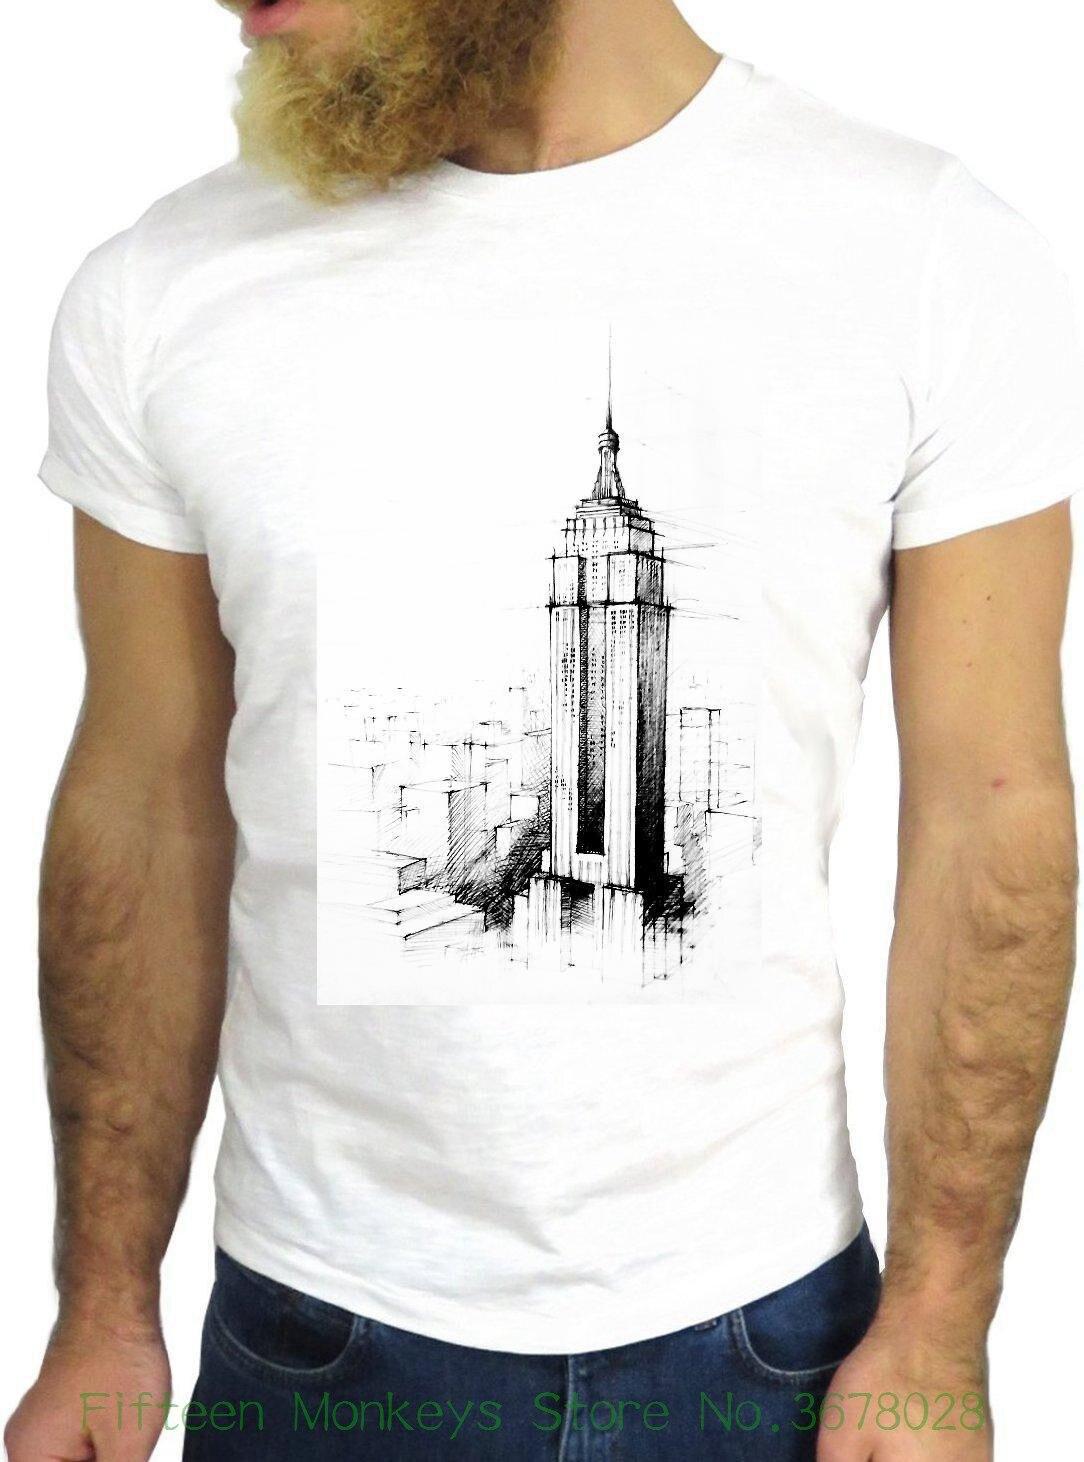 Clothing Tshirt T-shirt Jode Ggg24 Z0693 Skyscraper Fun Cool Vintage Rock Funny Fashion Cartoon